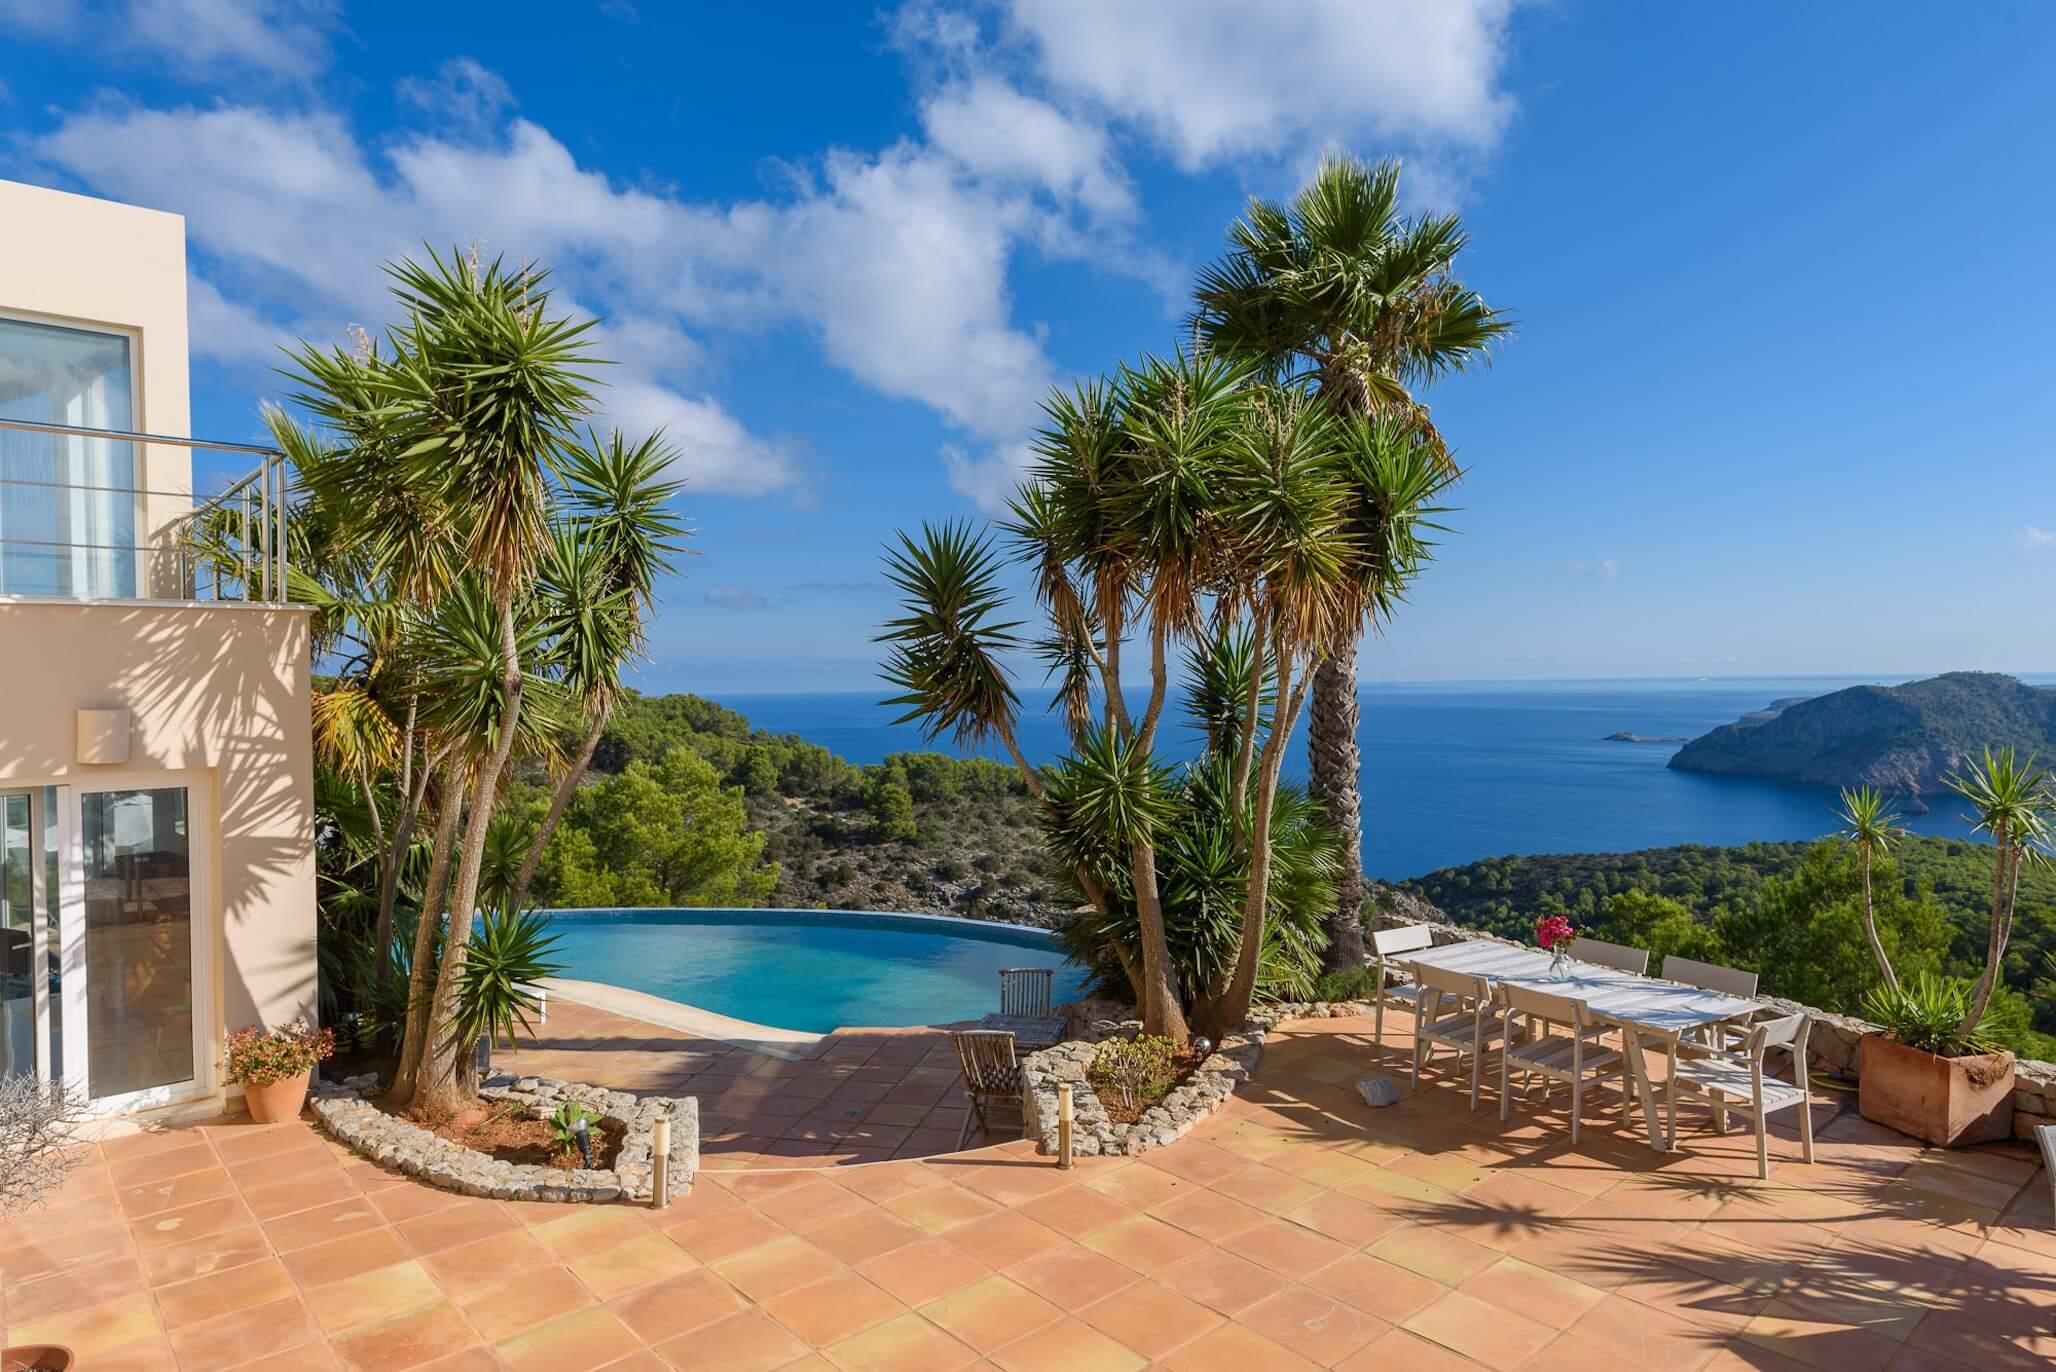 Luxury villas in Ibiza: Villa Prime, a stunning holiday villa to rent in Ibiza